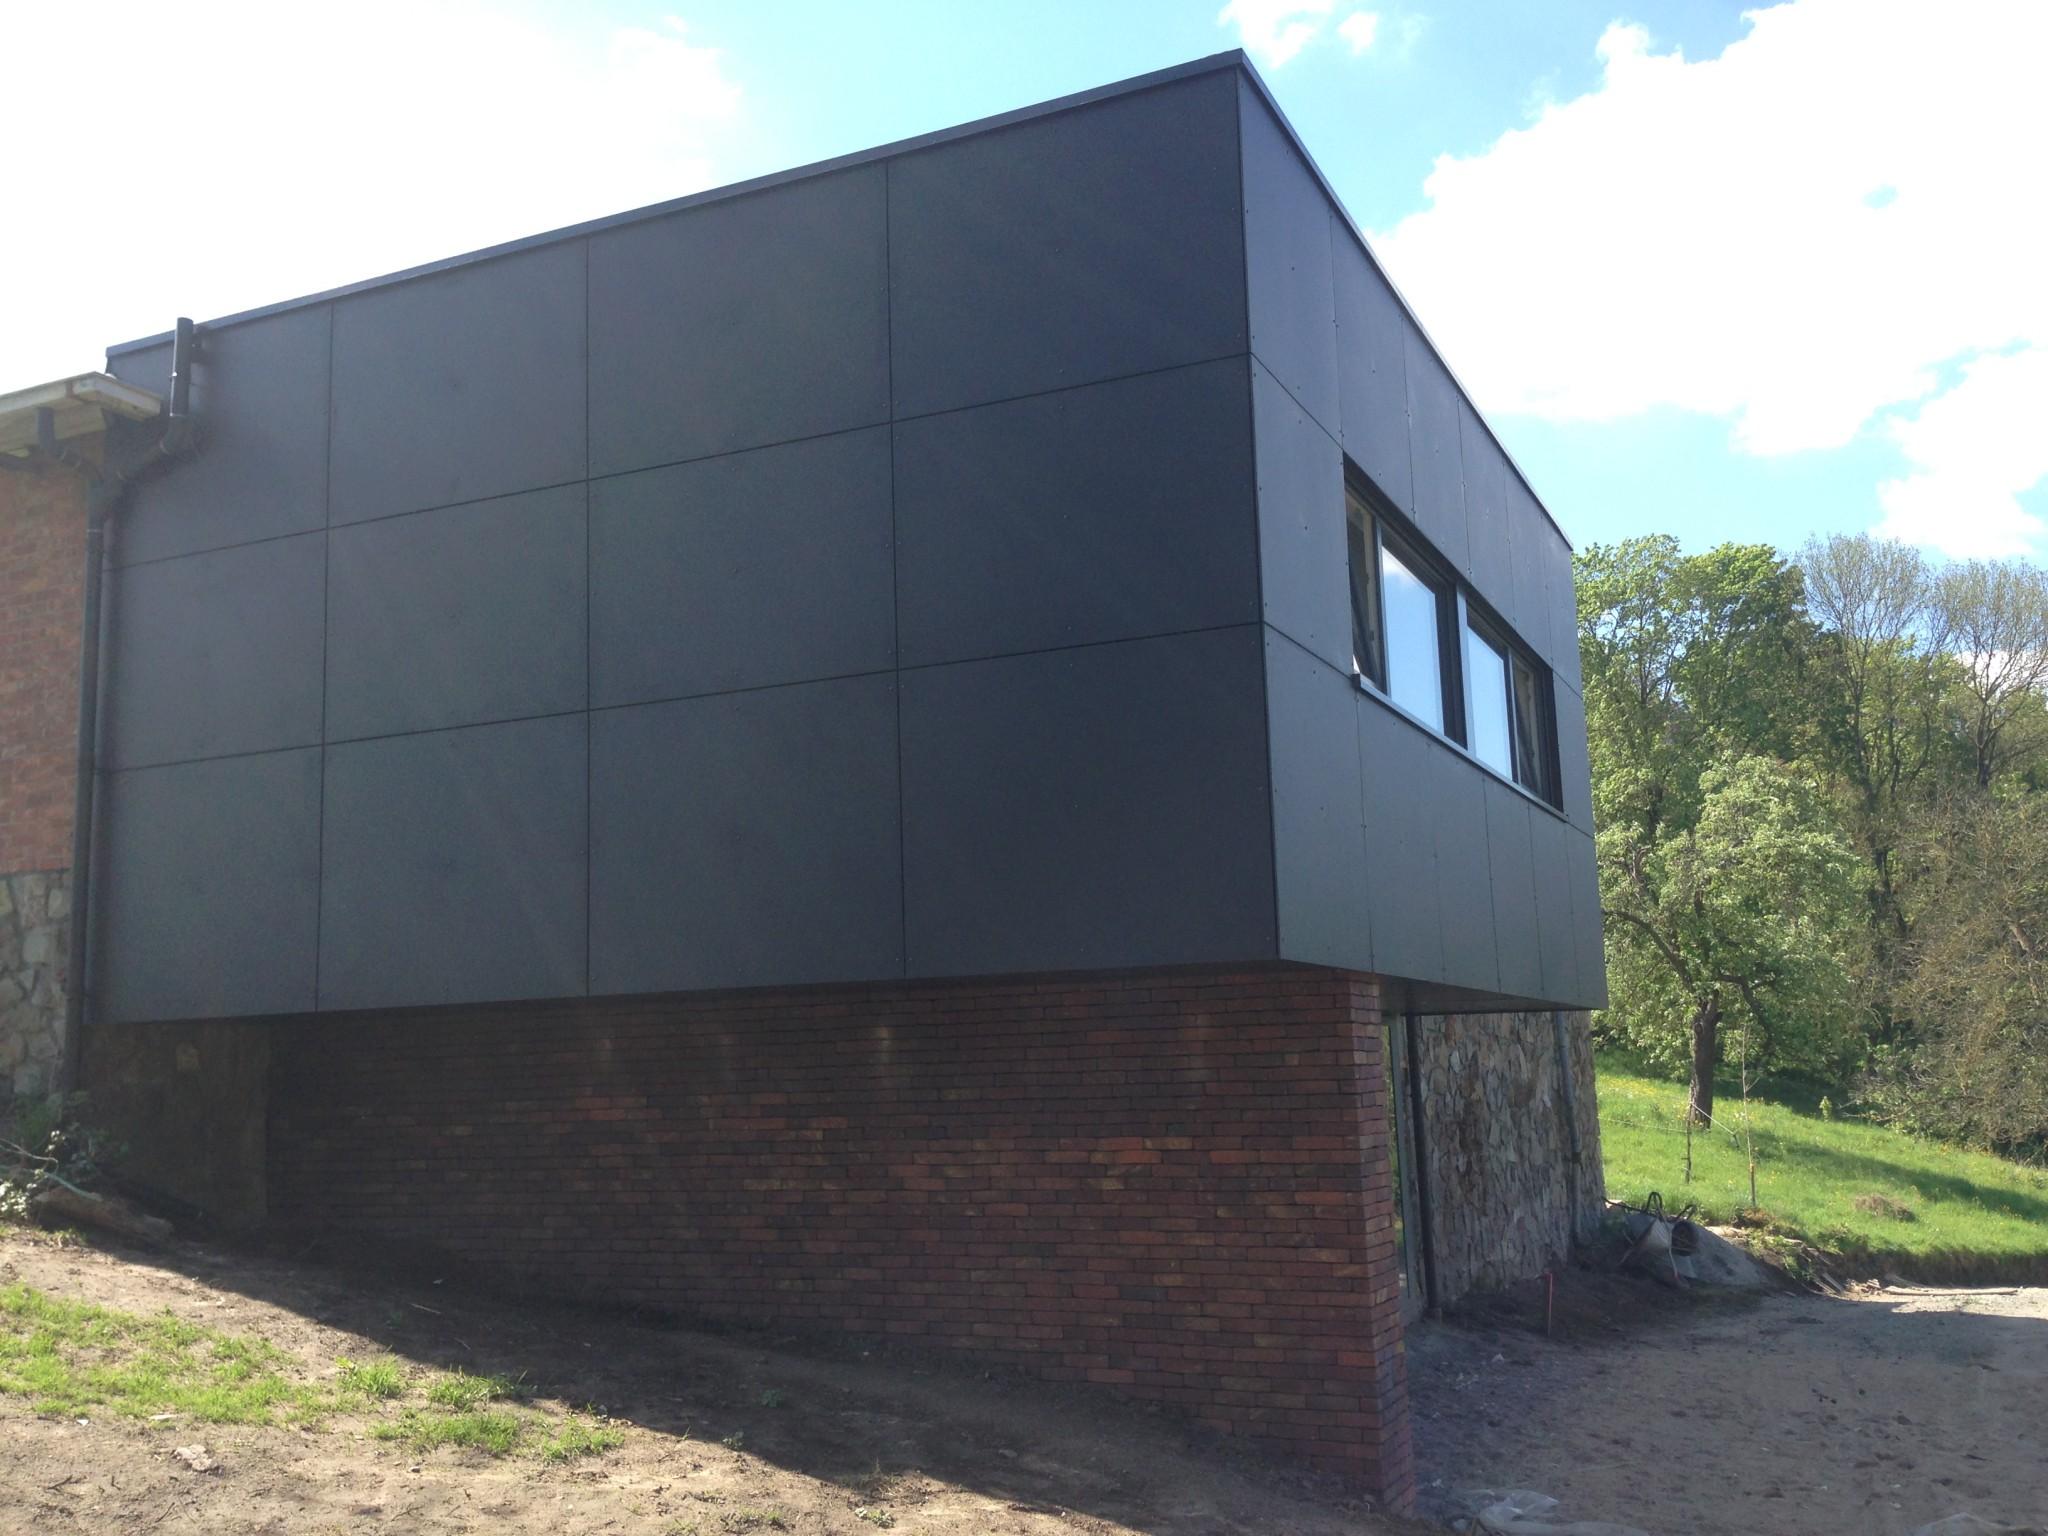 Tilklin brice architecte liège annexe ossature bois bureau d